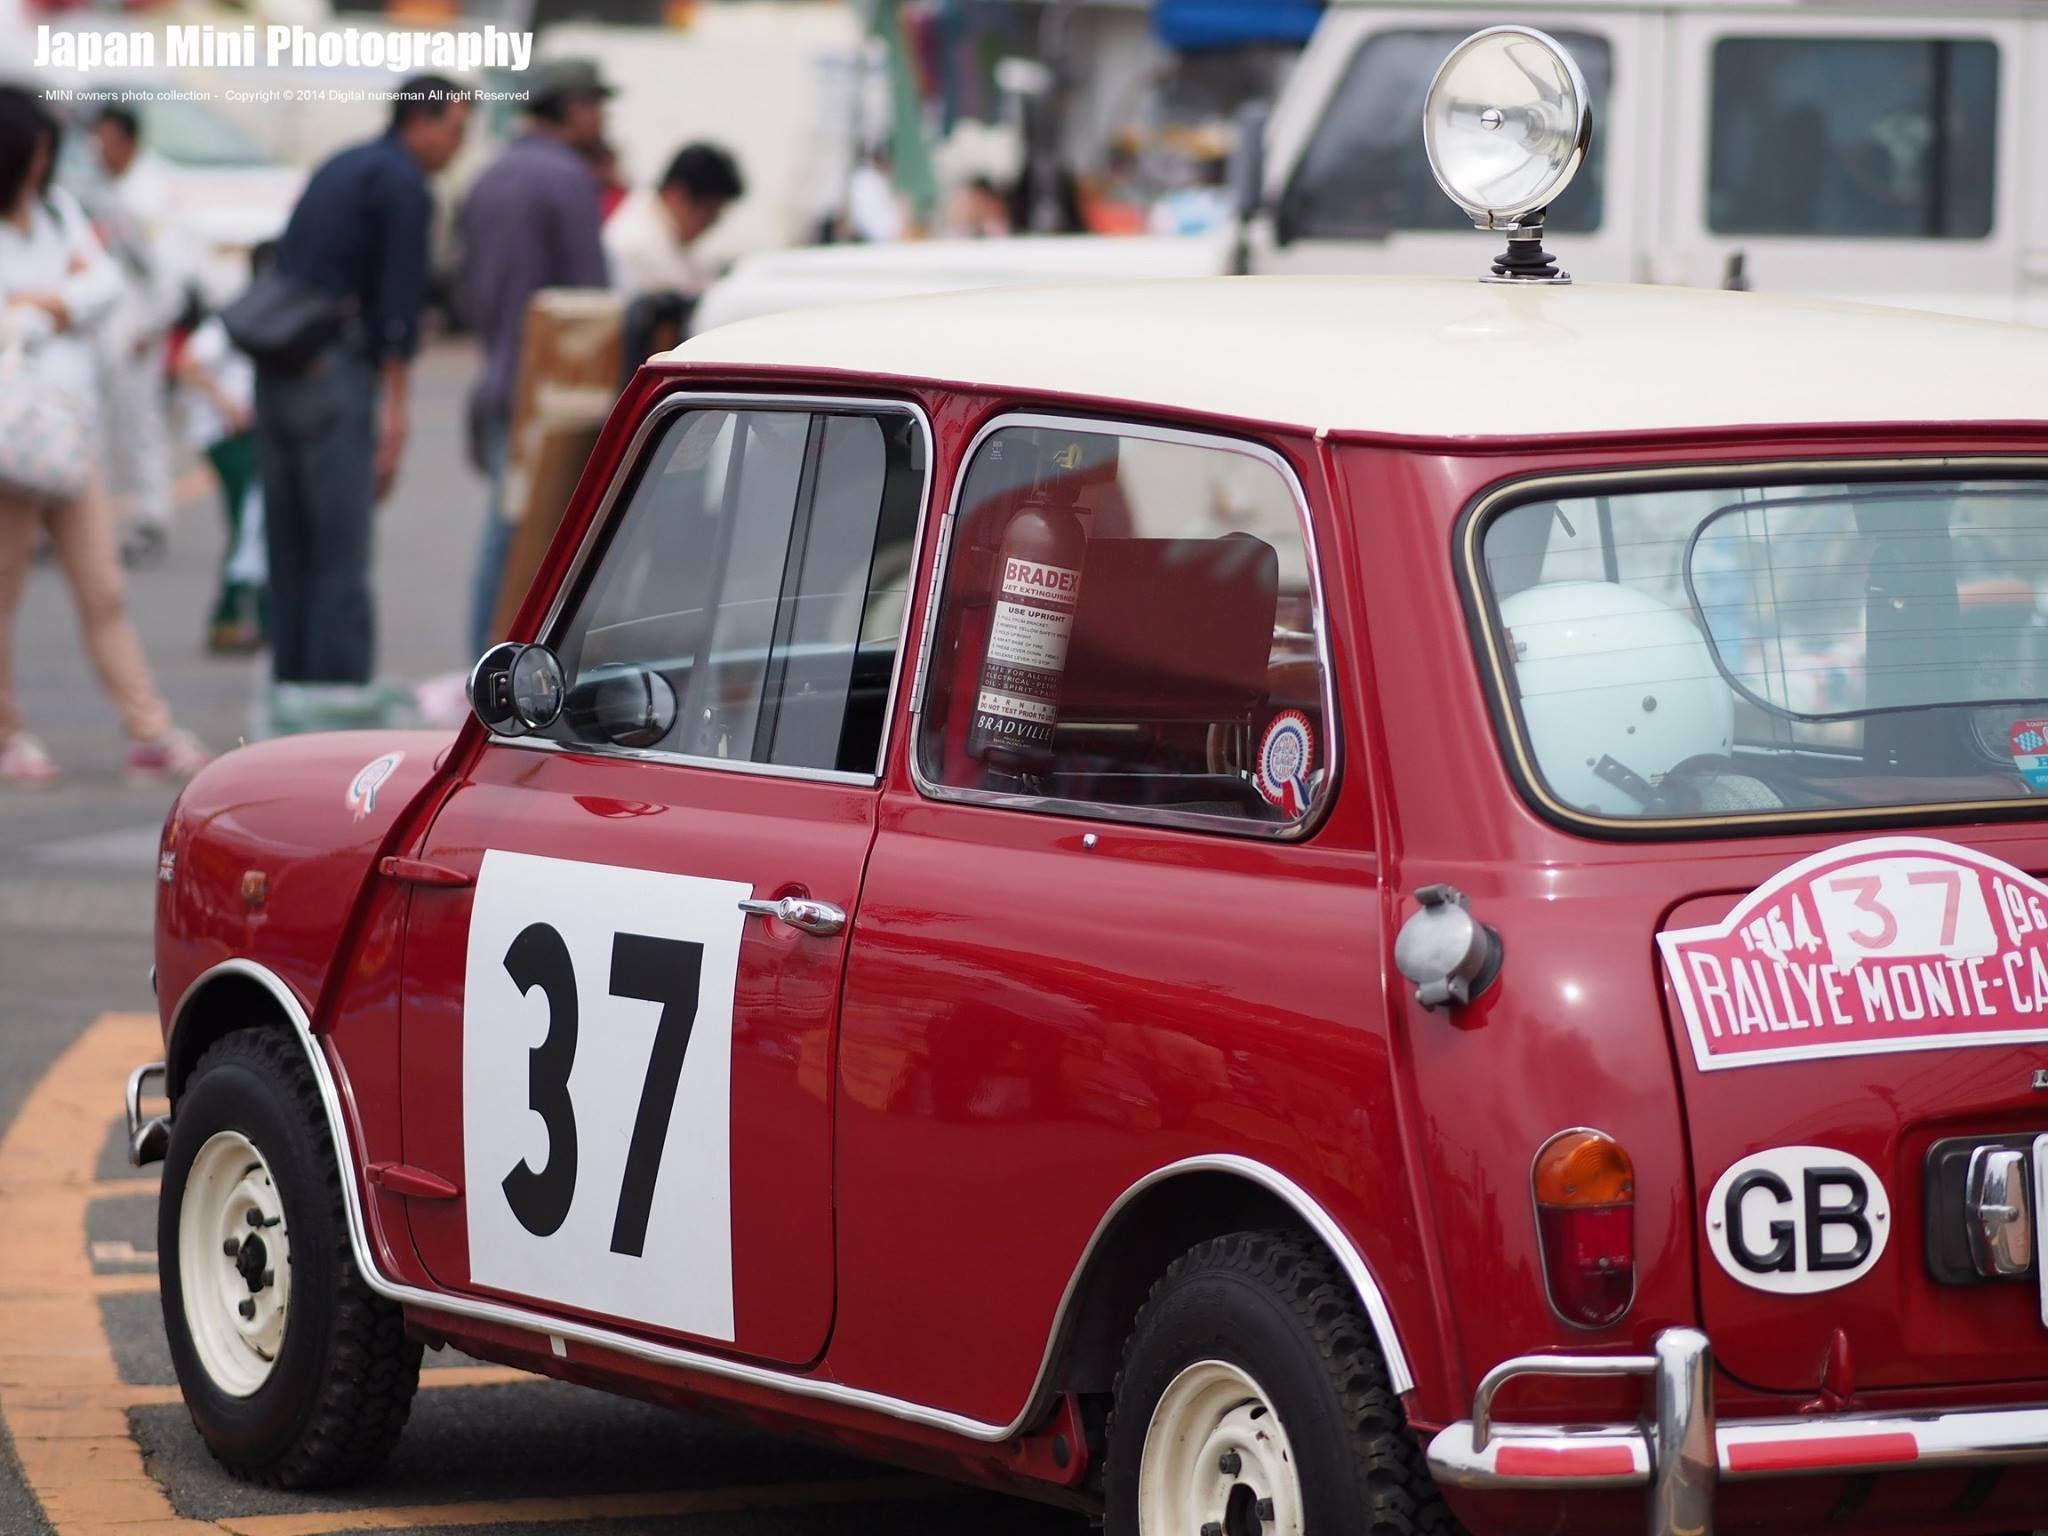 33 Ejb 1964 Monte Carlo Rally Hopkirk Red Mini